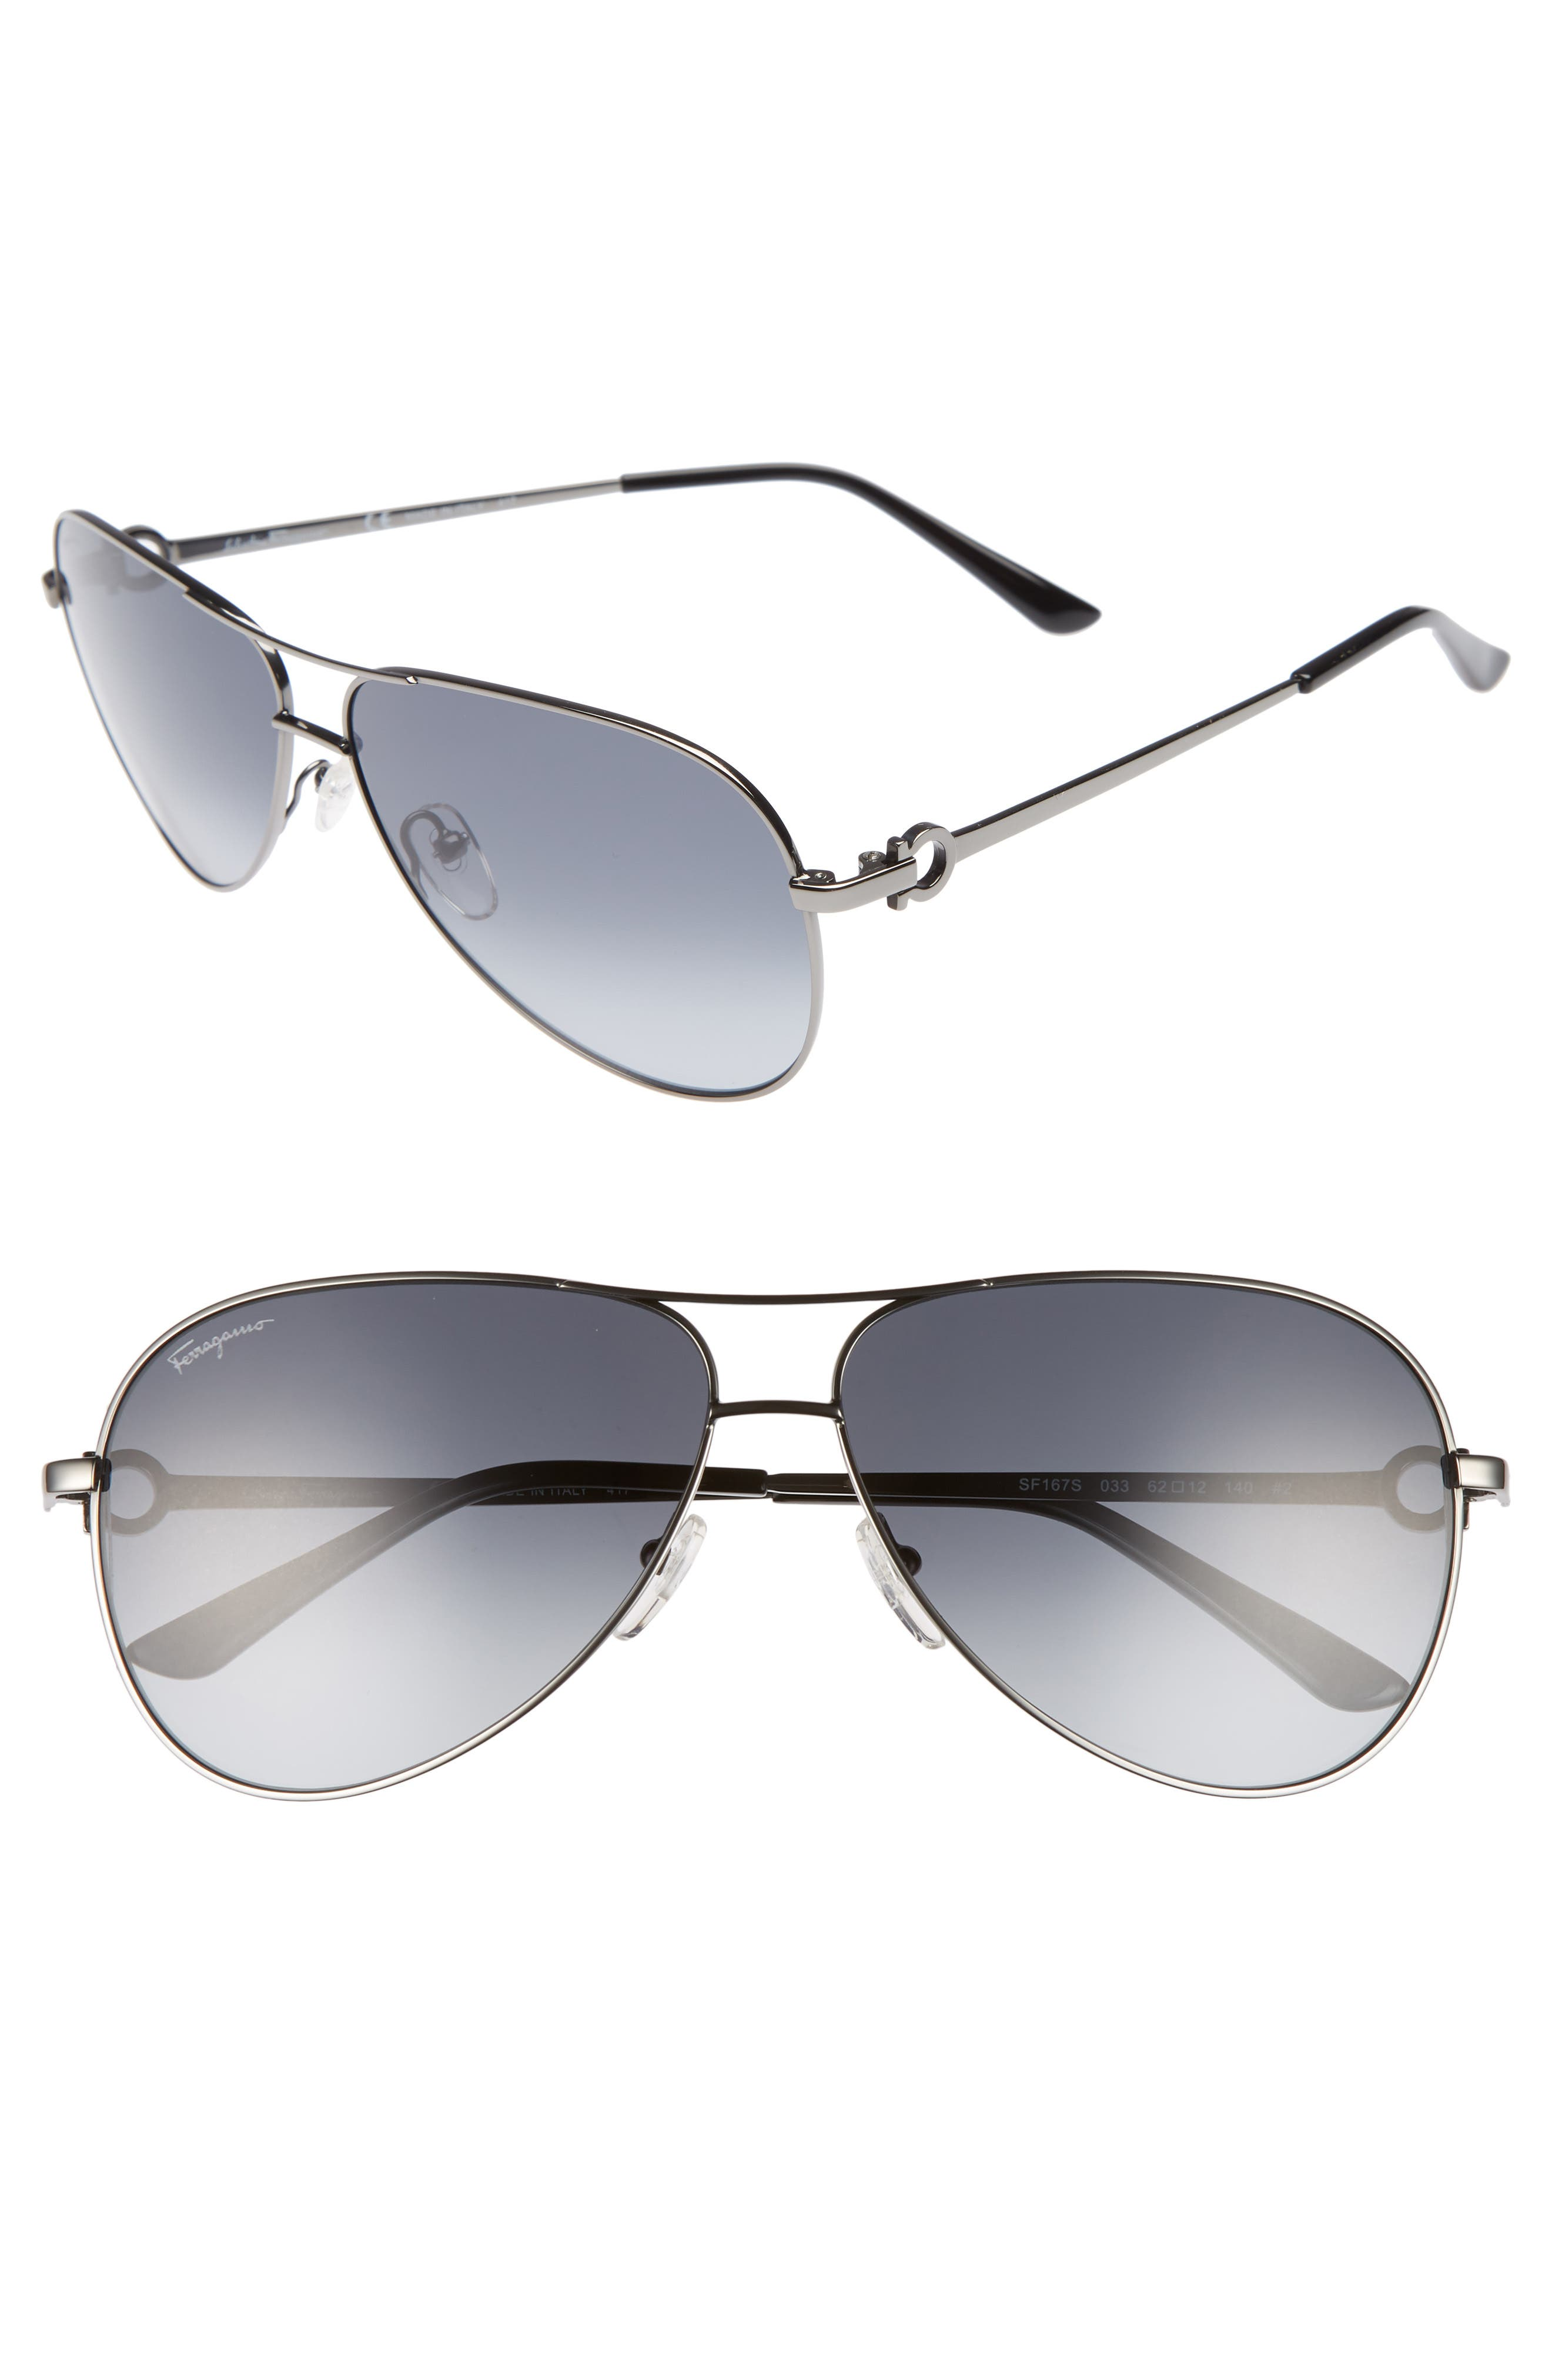 Gancio 62mm Aviator Sunglasses,                             Main thumbnail 1, color,                             SHINY DARK GUNMETAL